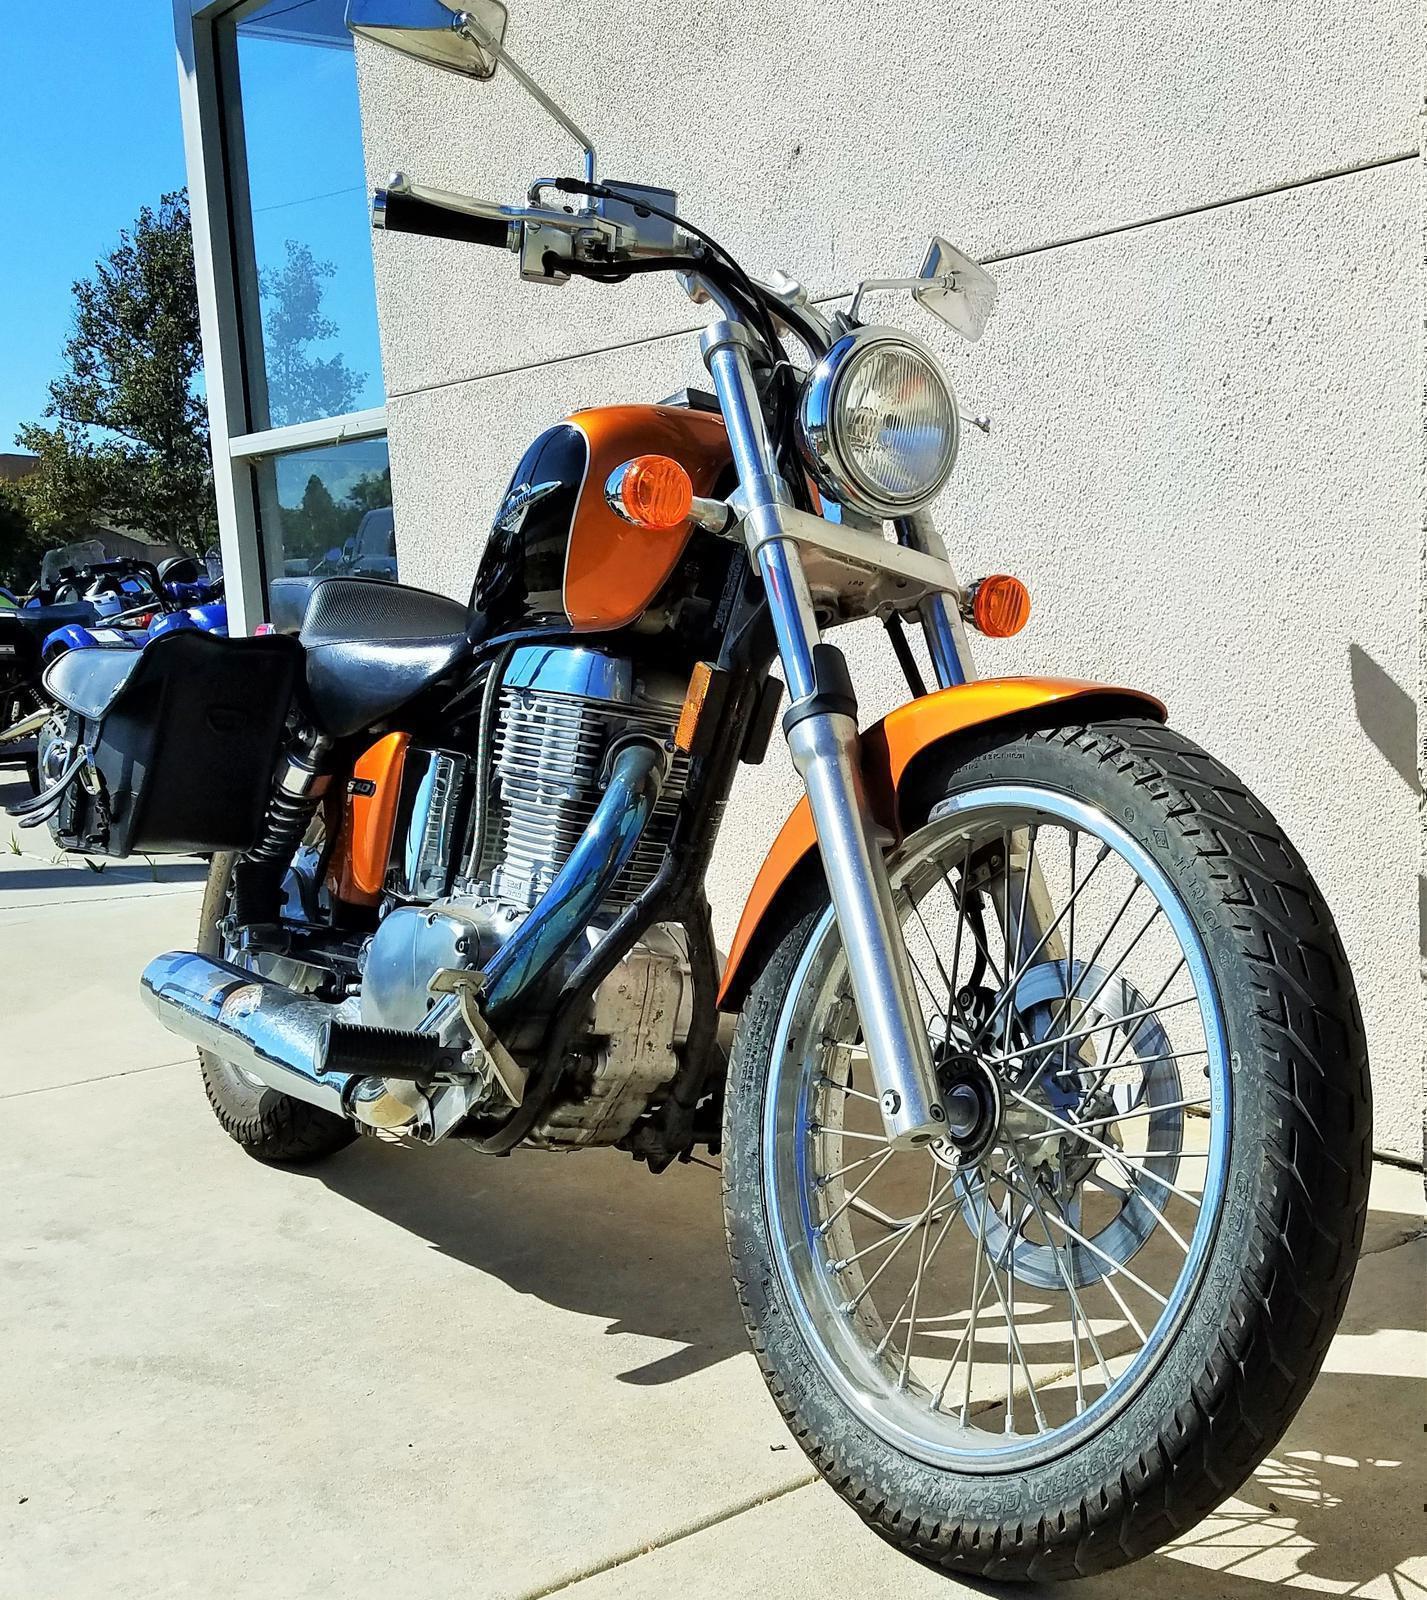 2012 Suzuki BOULEVARD S40 for sale in Ventura, CA. Cal Coast ...